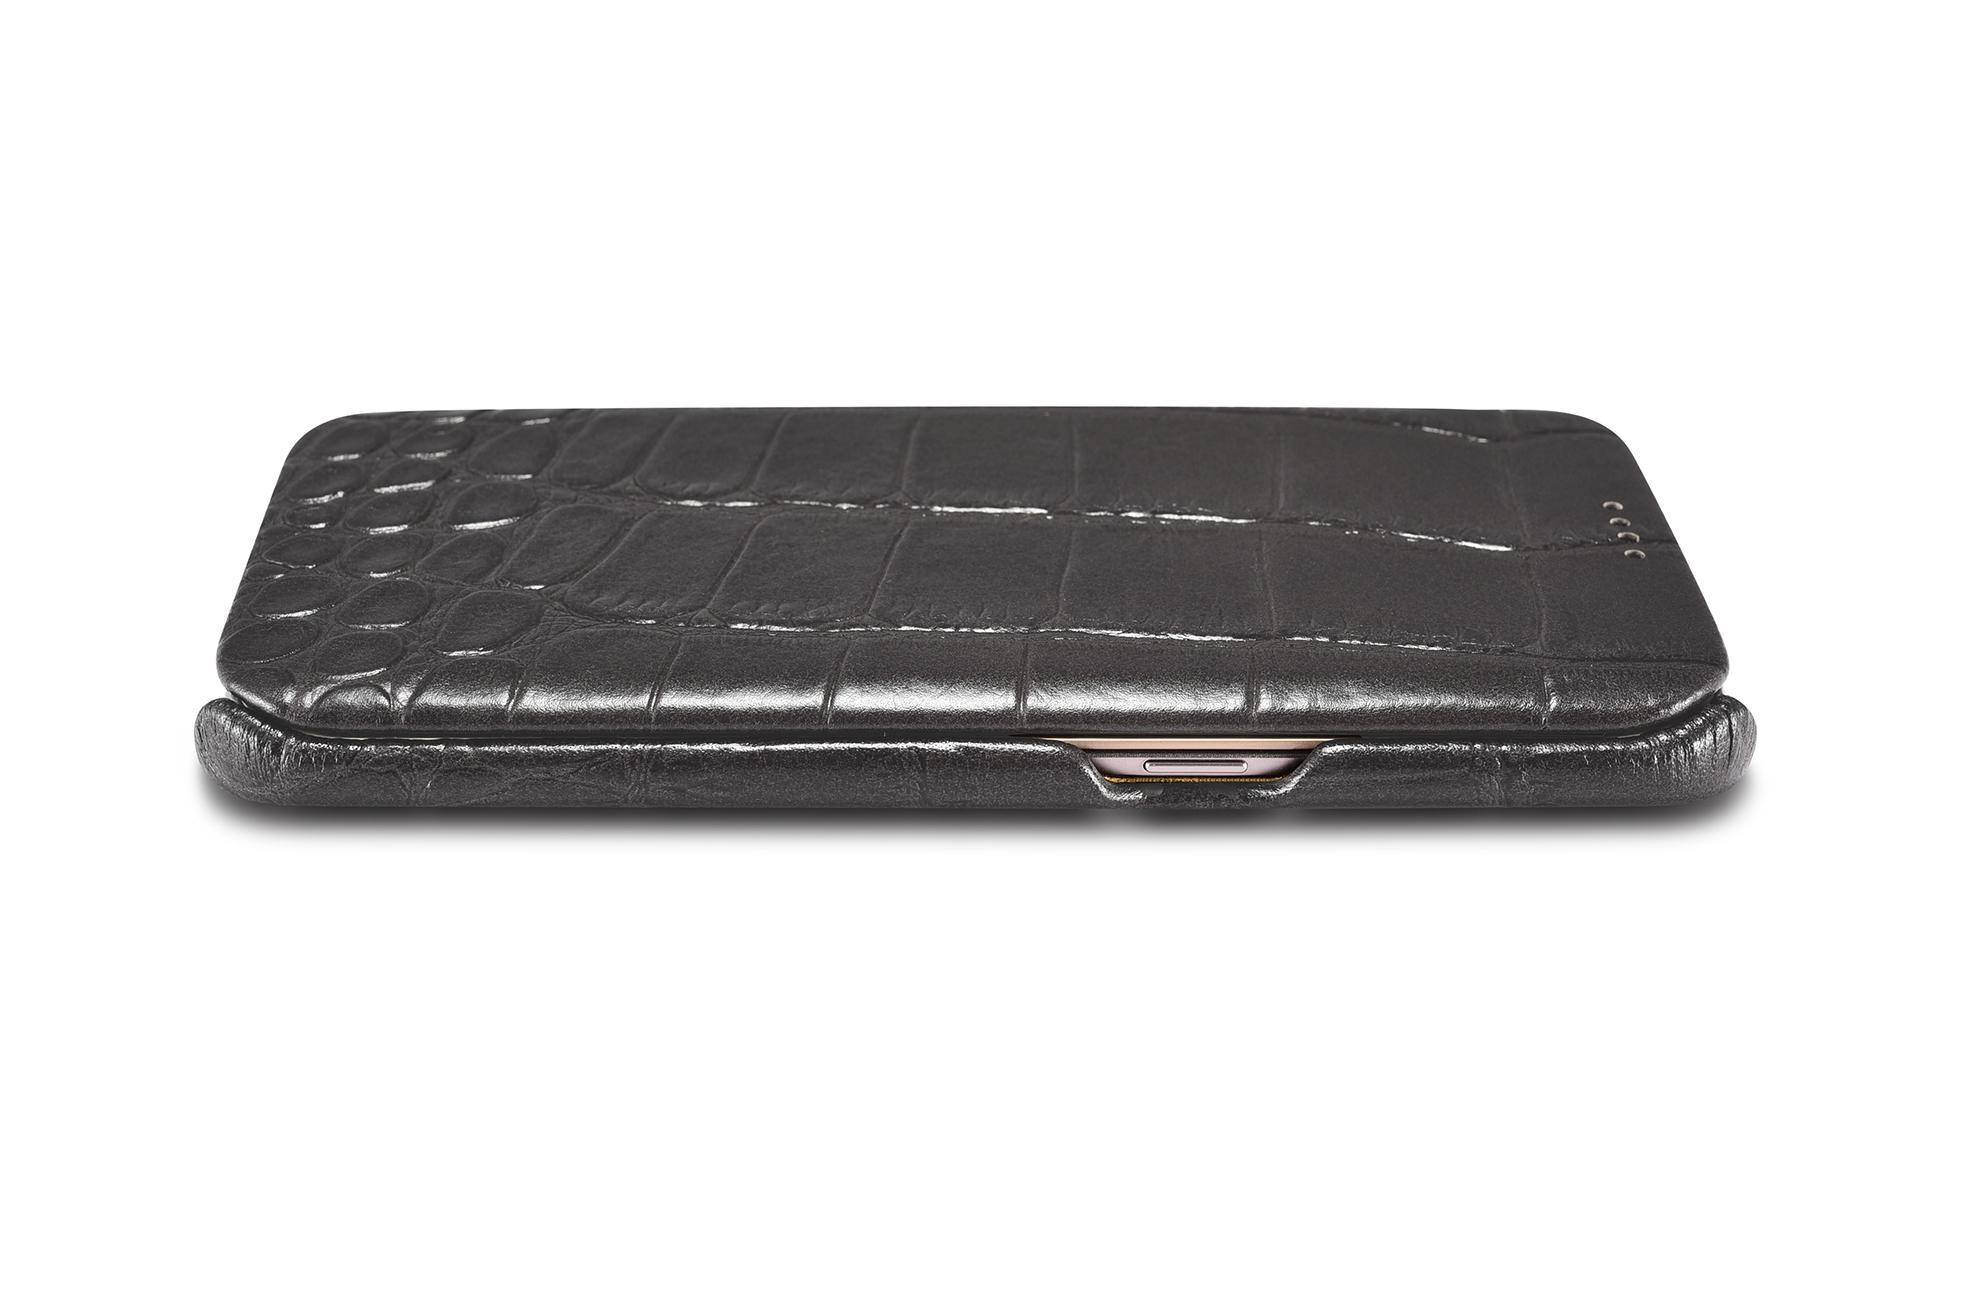 iCarer Samsung Galaxy S7 Edge Embossed Crocodile Genuine Leather Folio Case 6